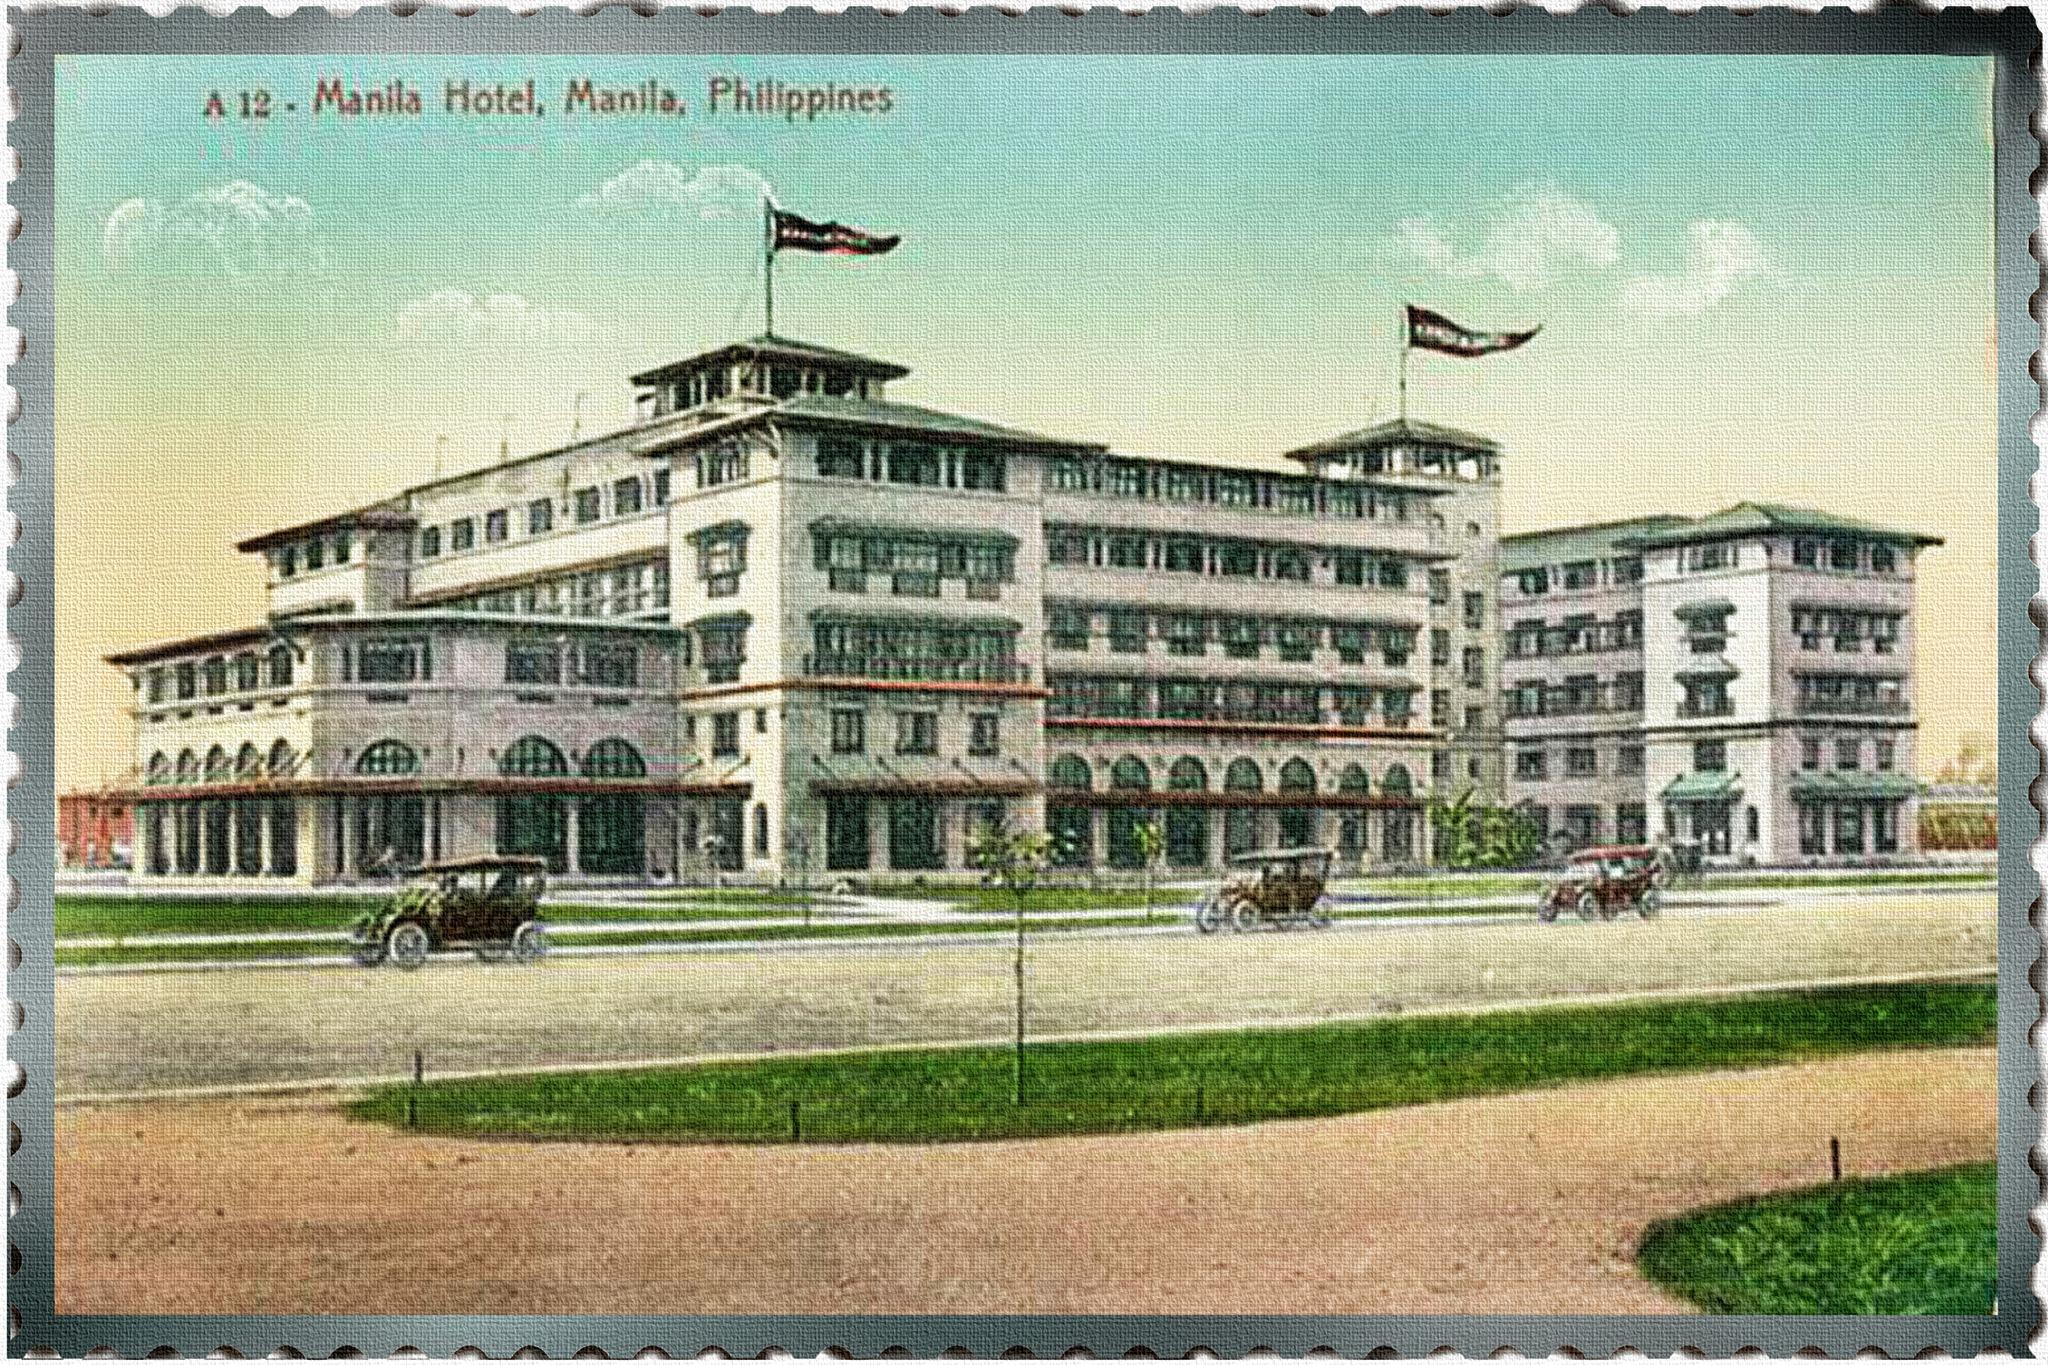 Manila Hotel - Manila, Philippines